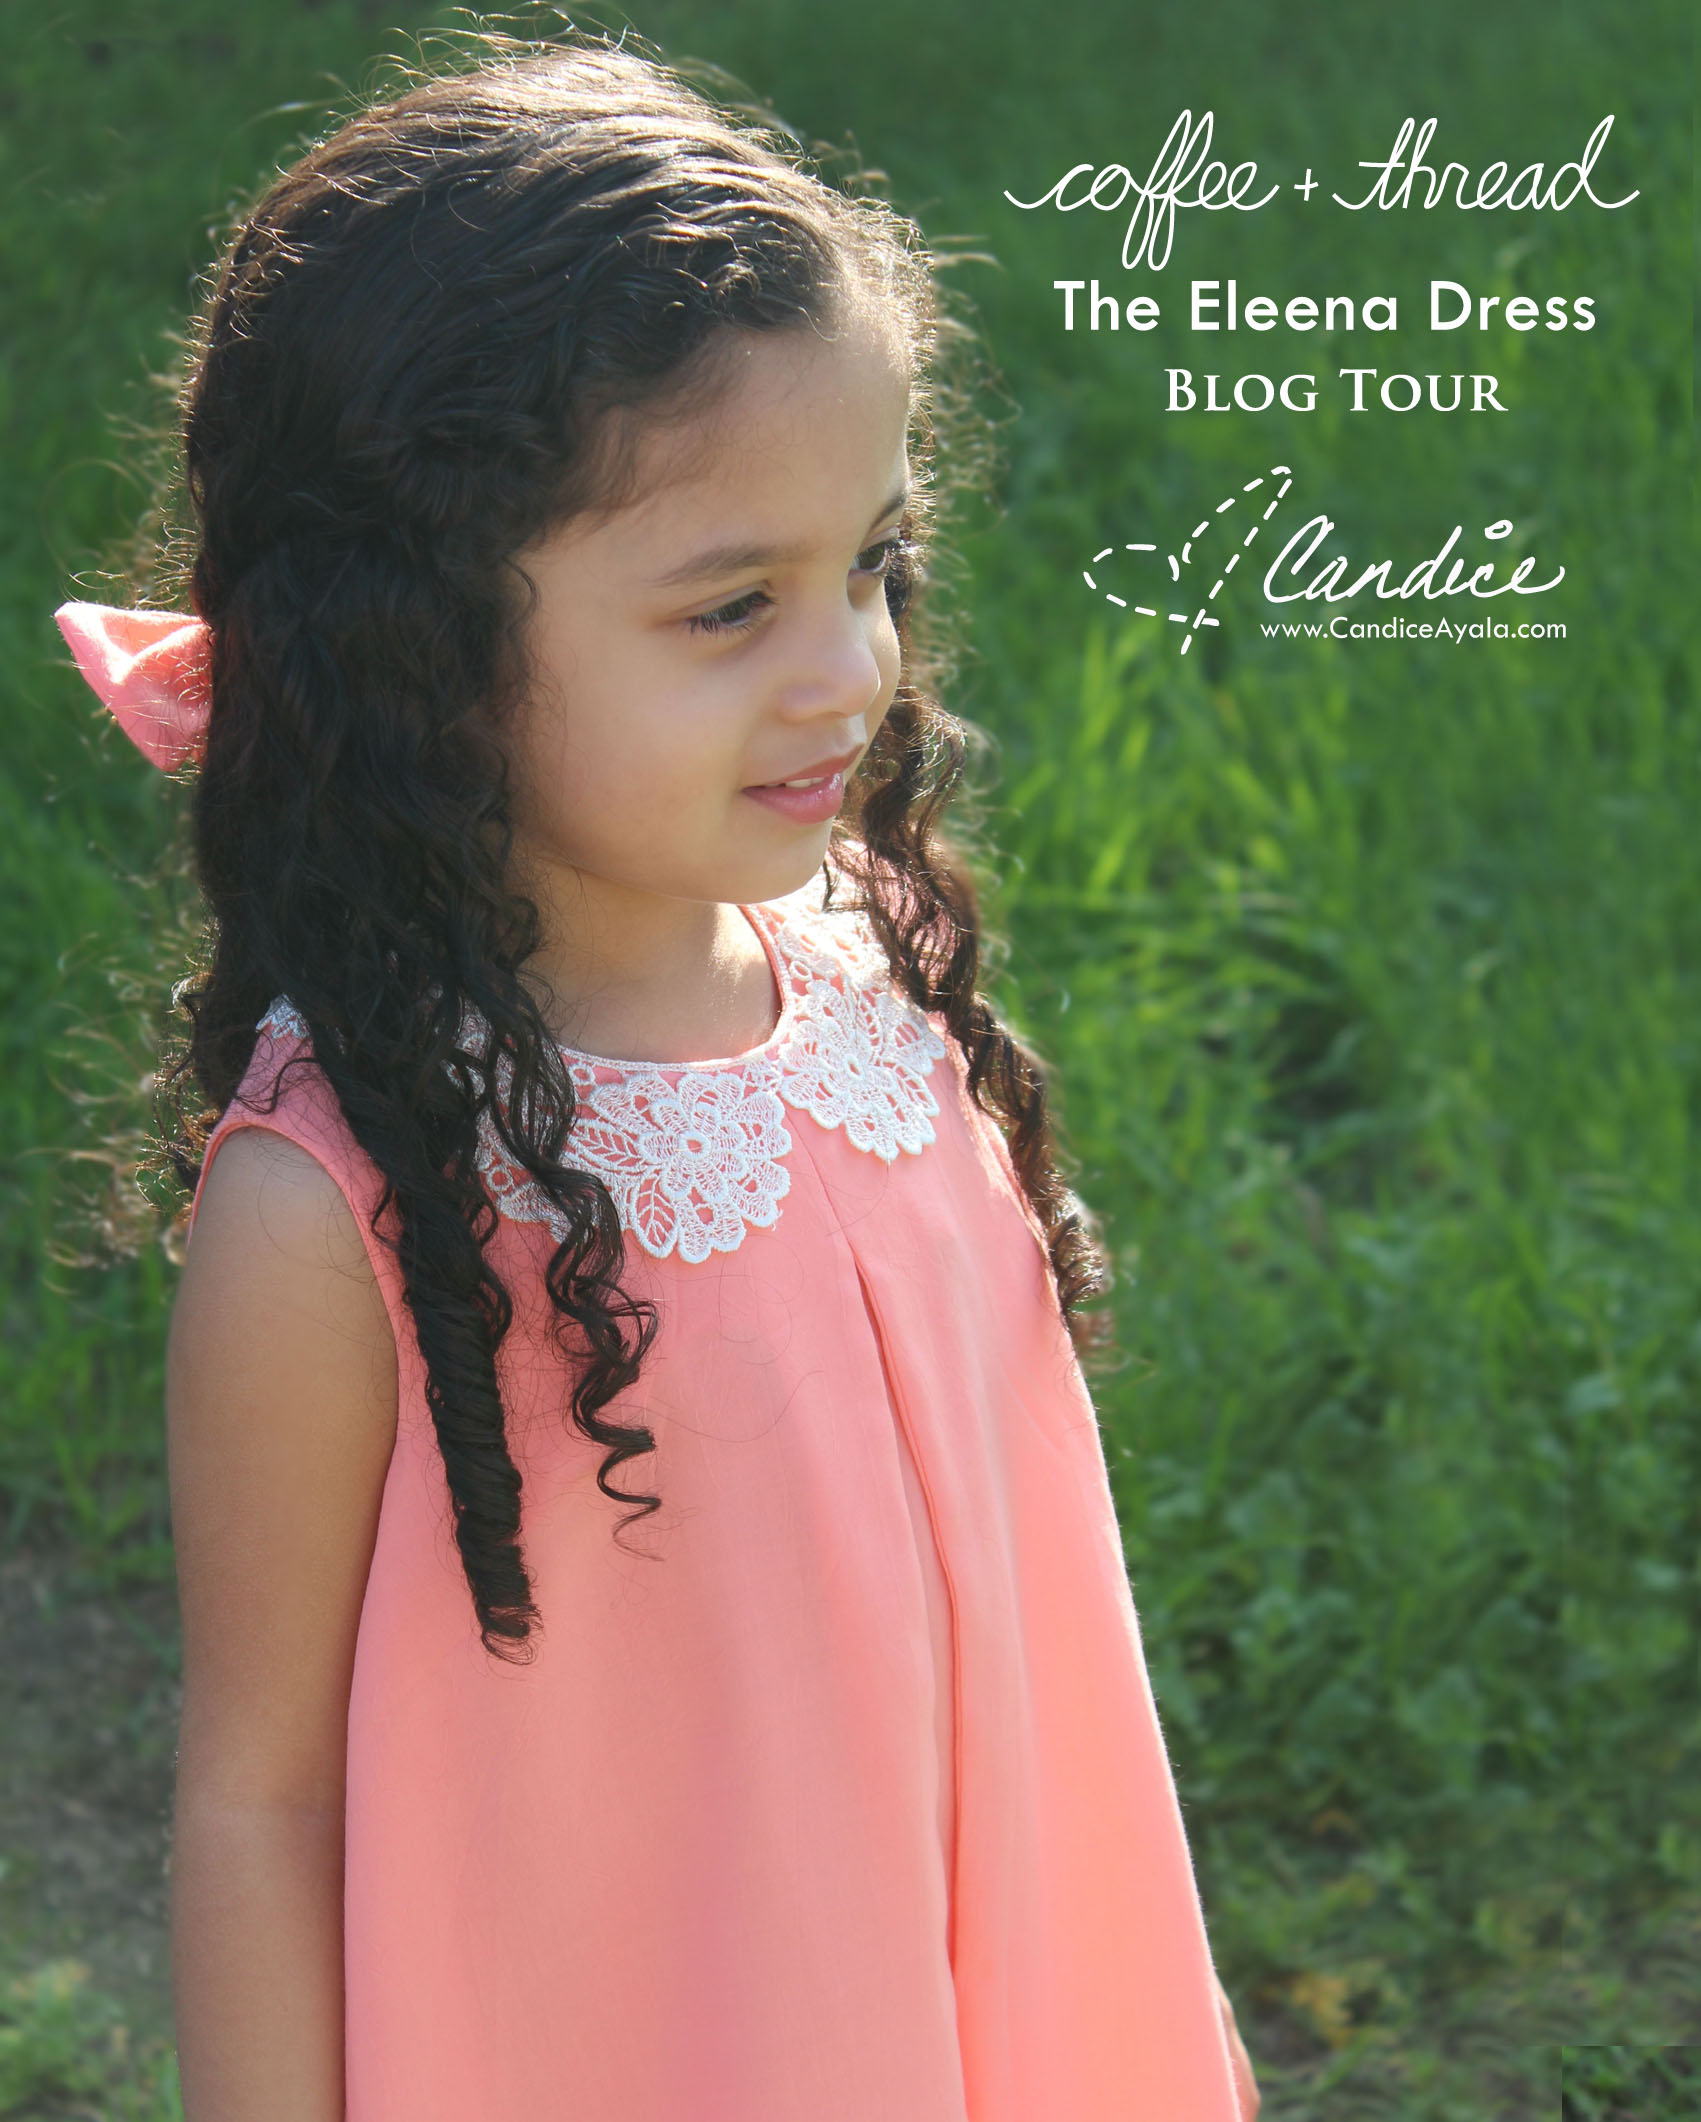 Coffee + Thread\'s Eleena Dress Blog Tour   Candice Ayala